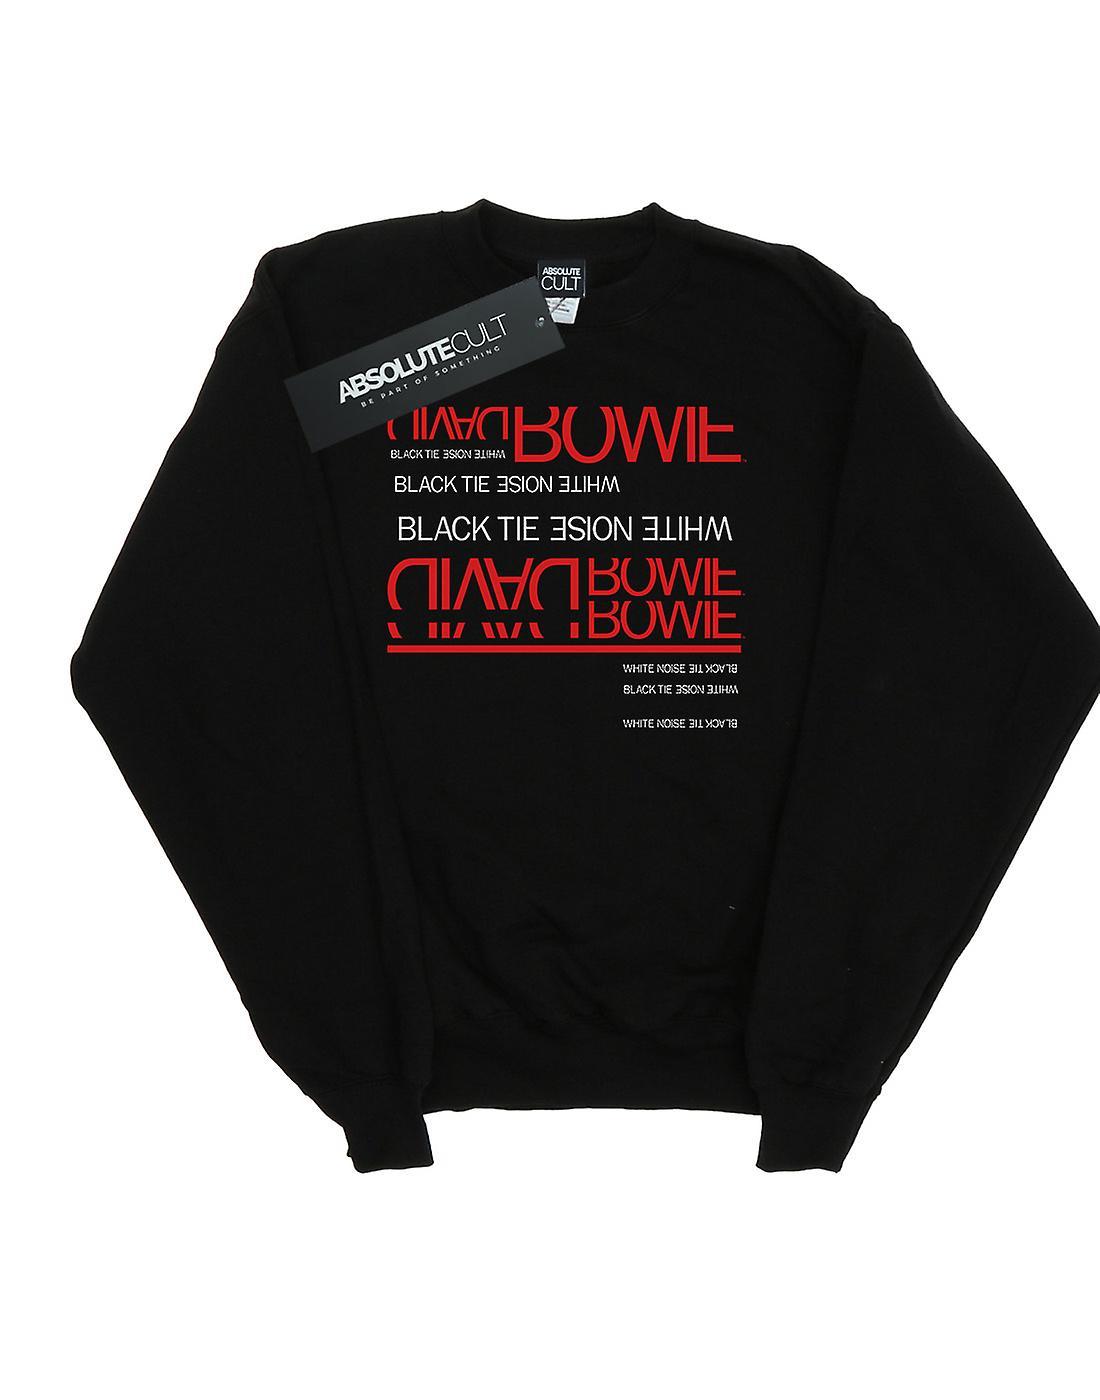 David Bowie Boys Black Tie White Noise Sweatshirt